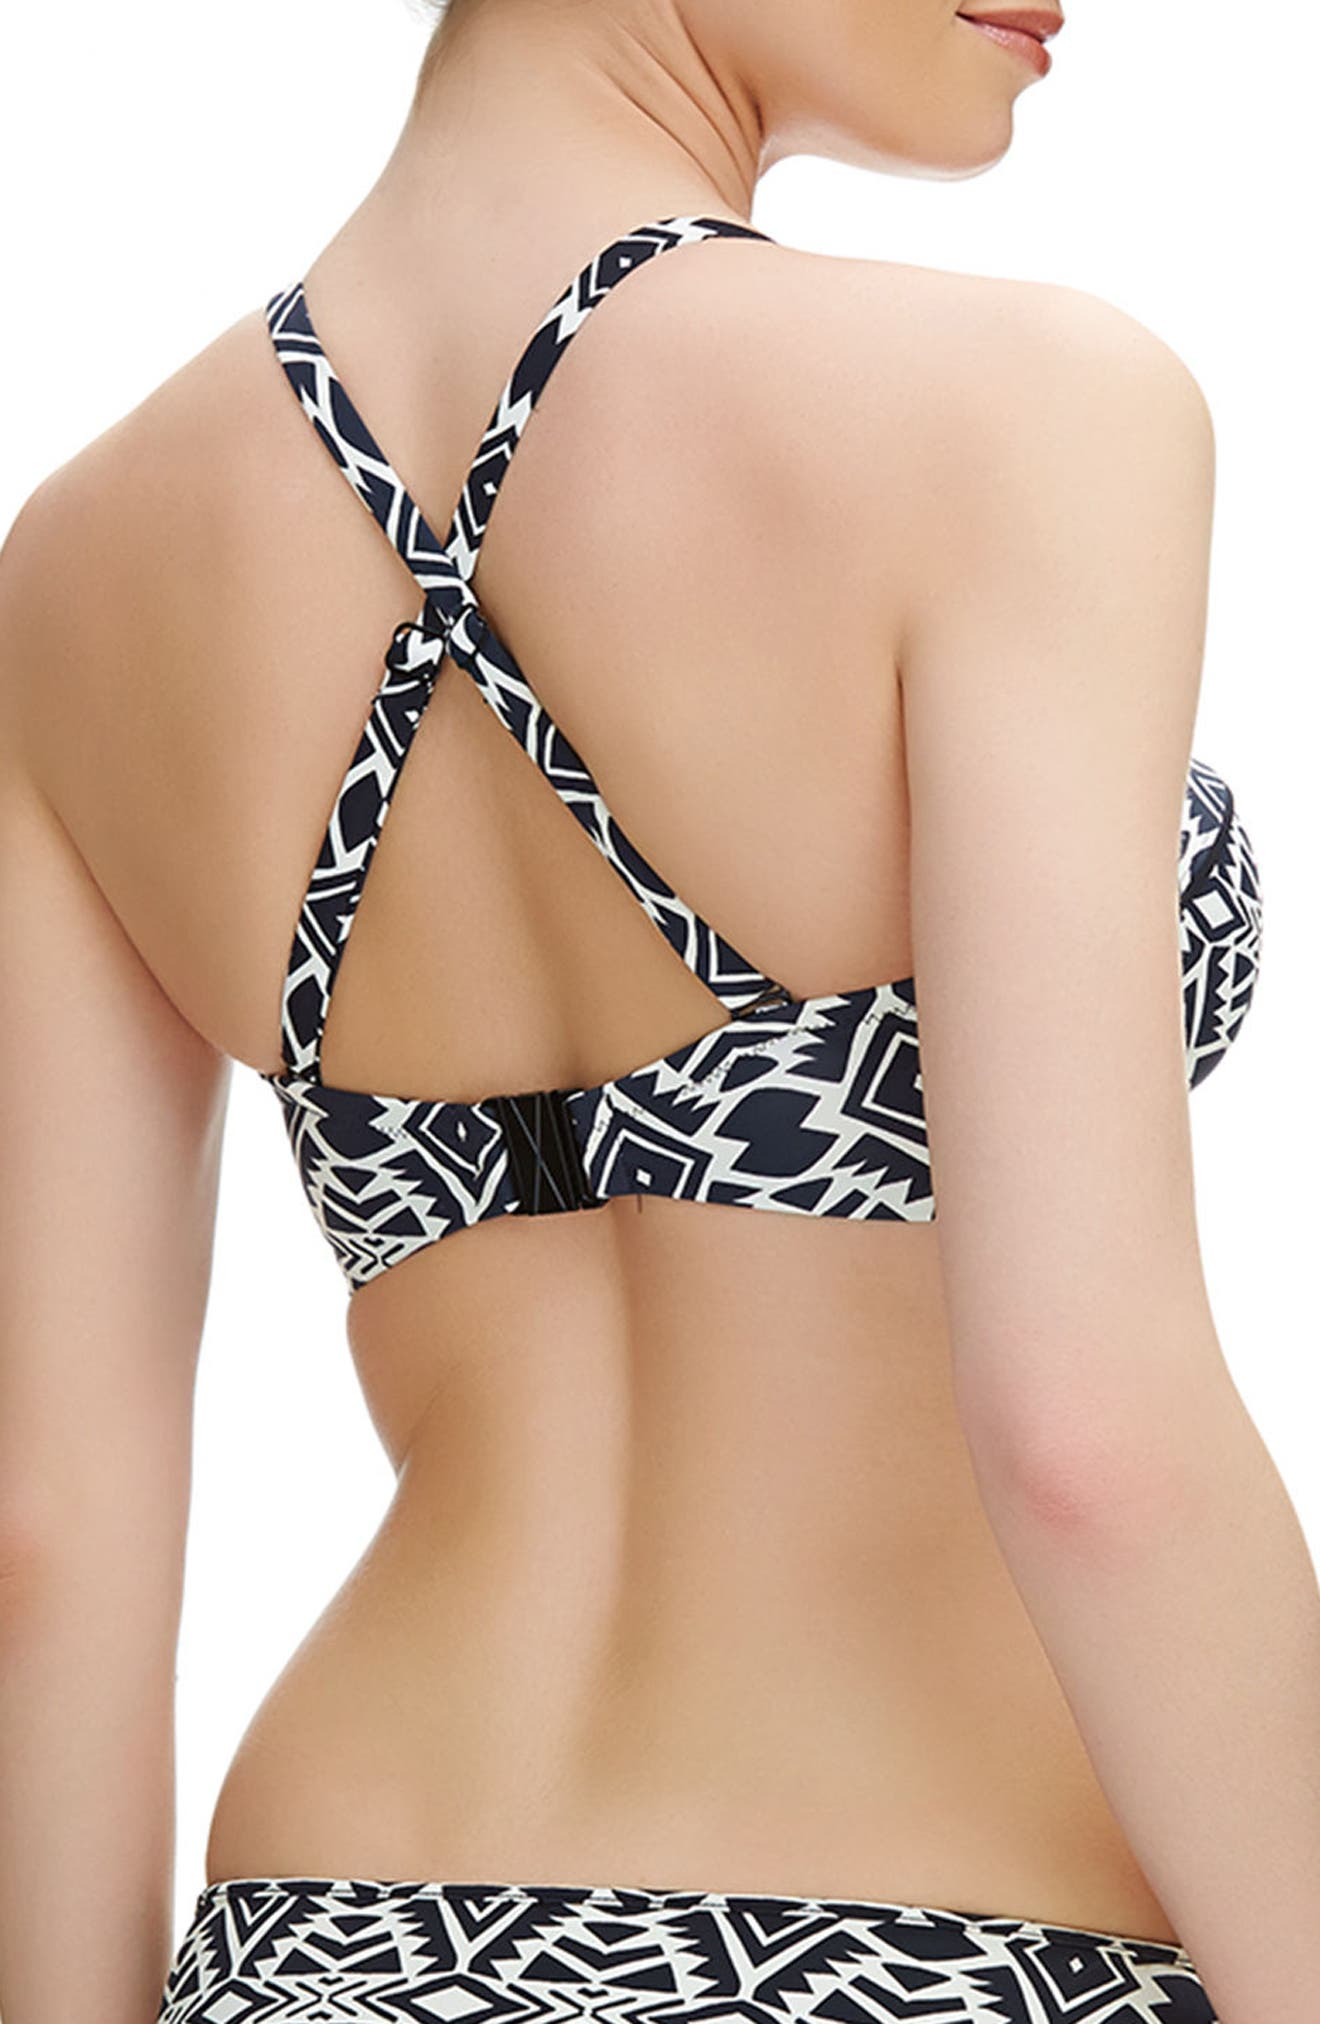 Beqa Underwire Bandeau Bikini Top,                             Alternate thumbnail 3, color,                             018